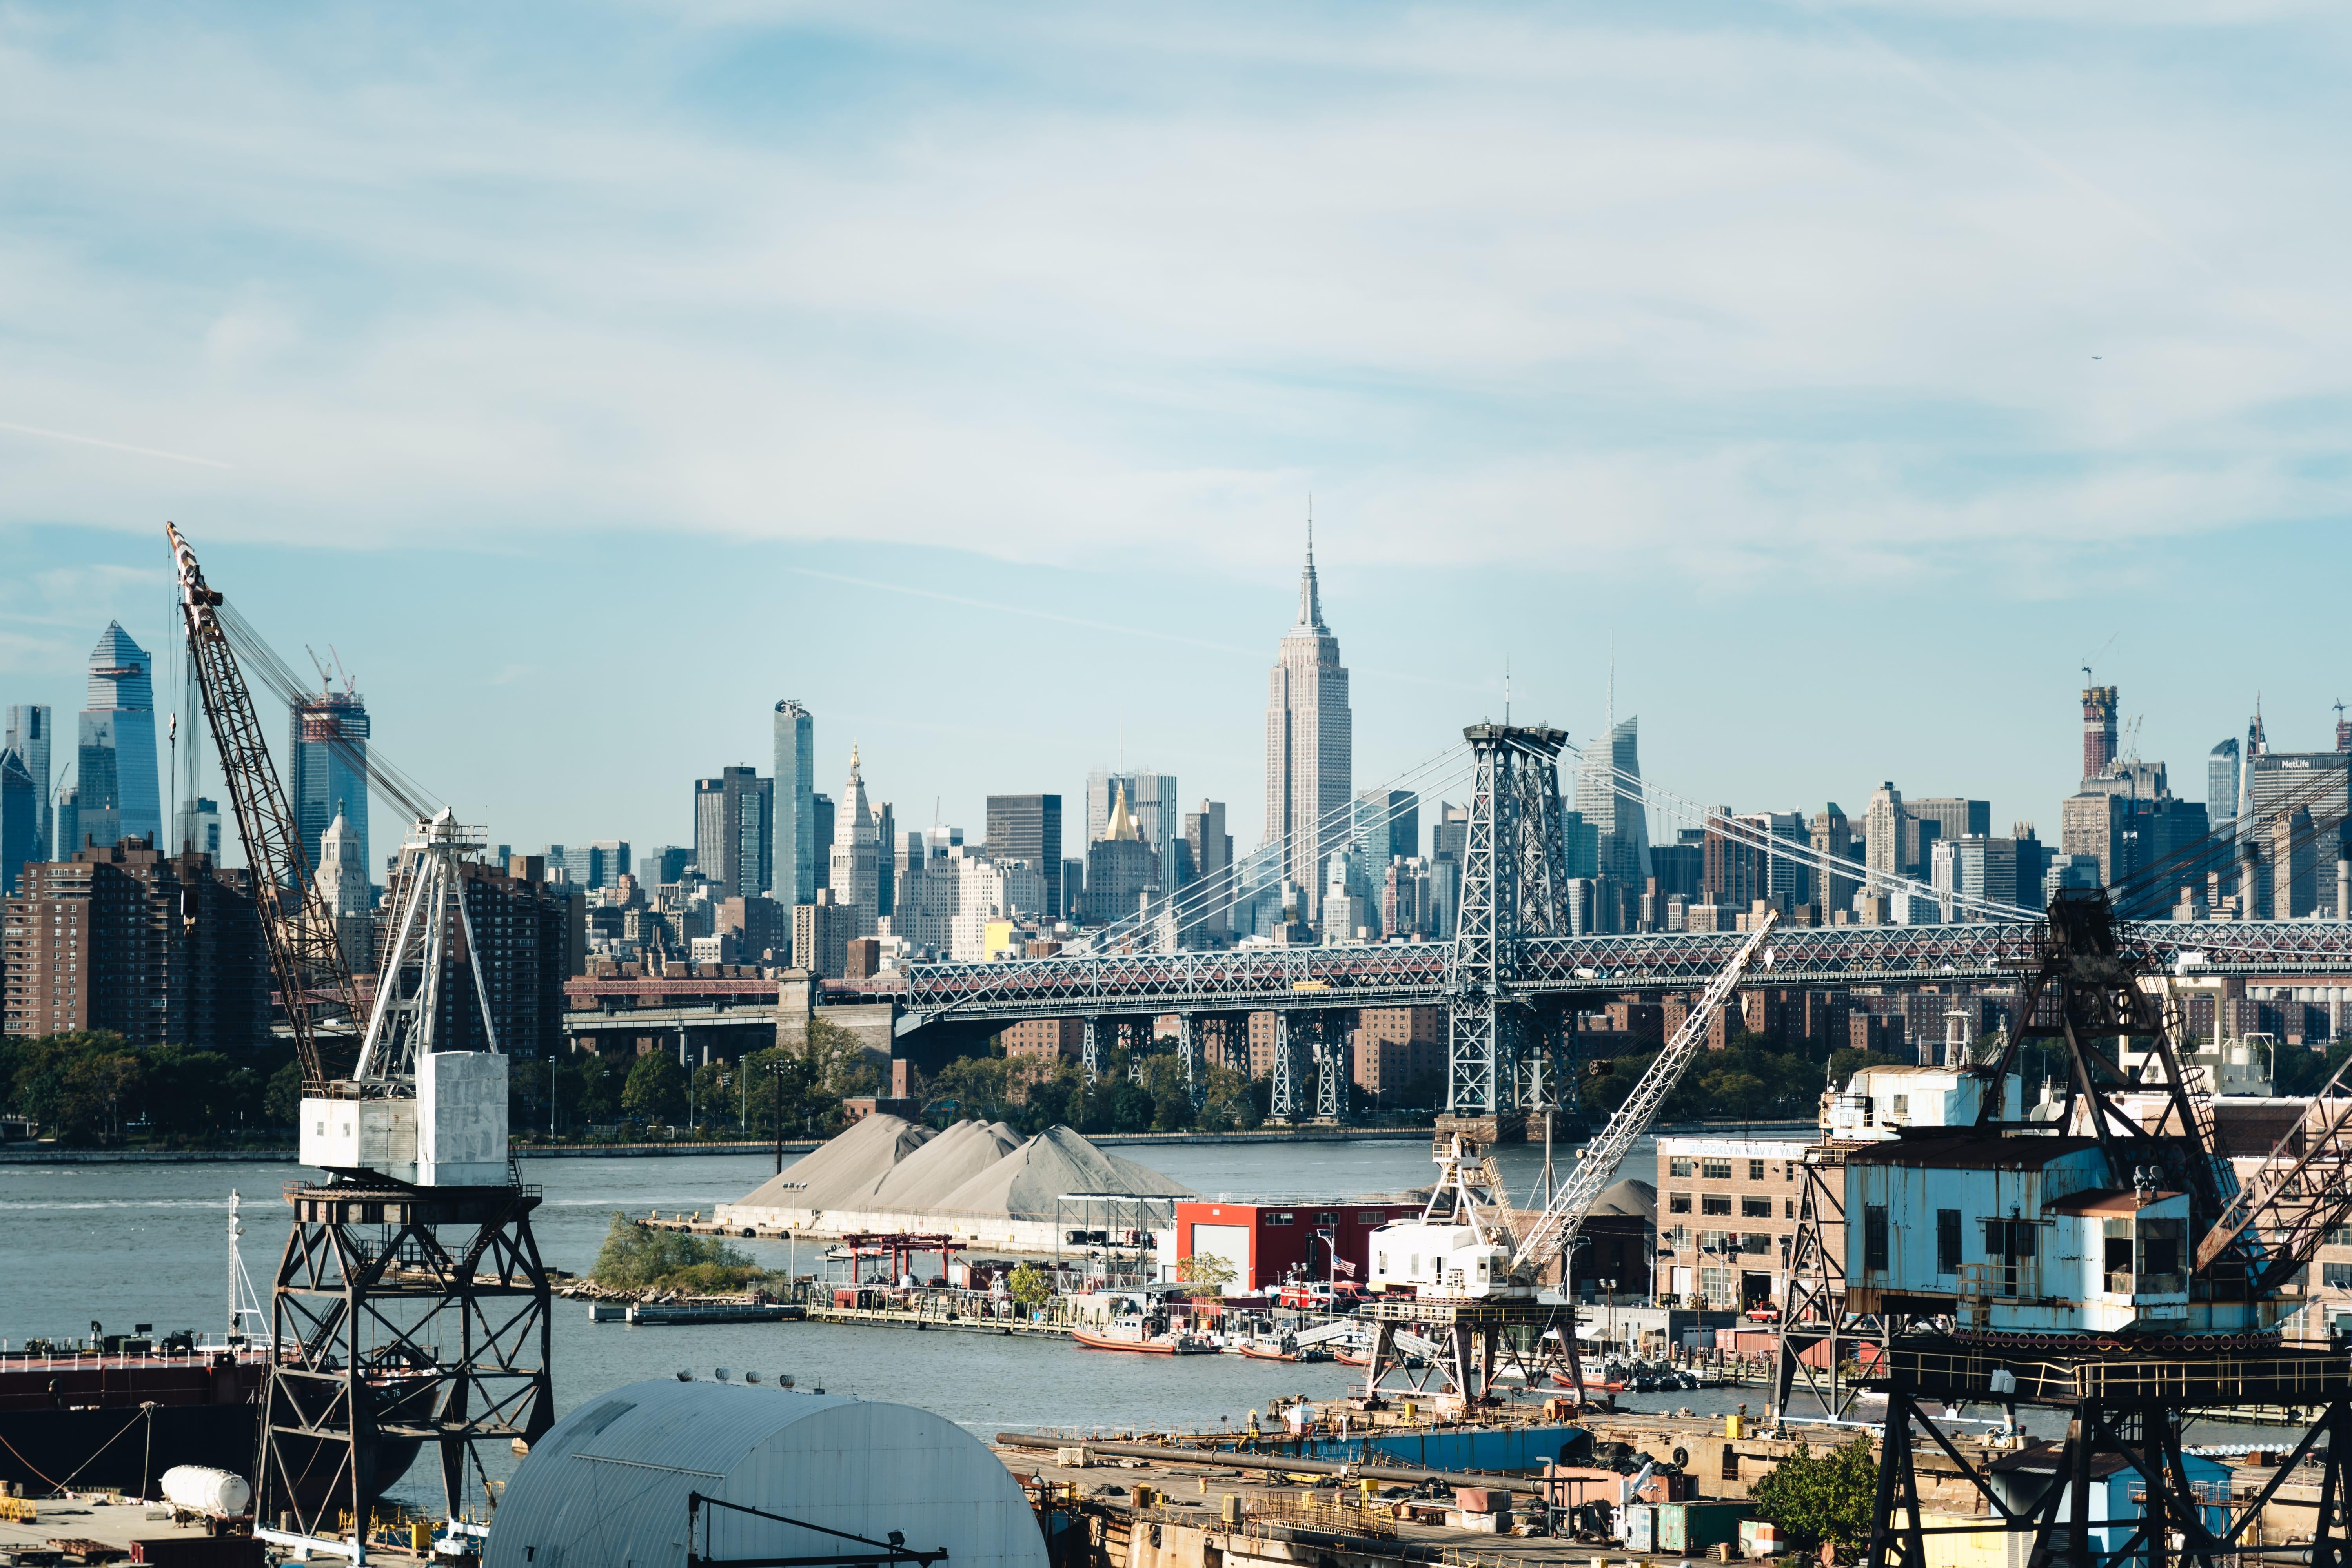 Proxyclick Brooklyn Navy Yard